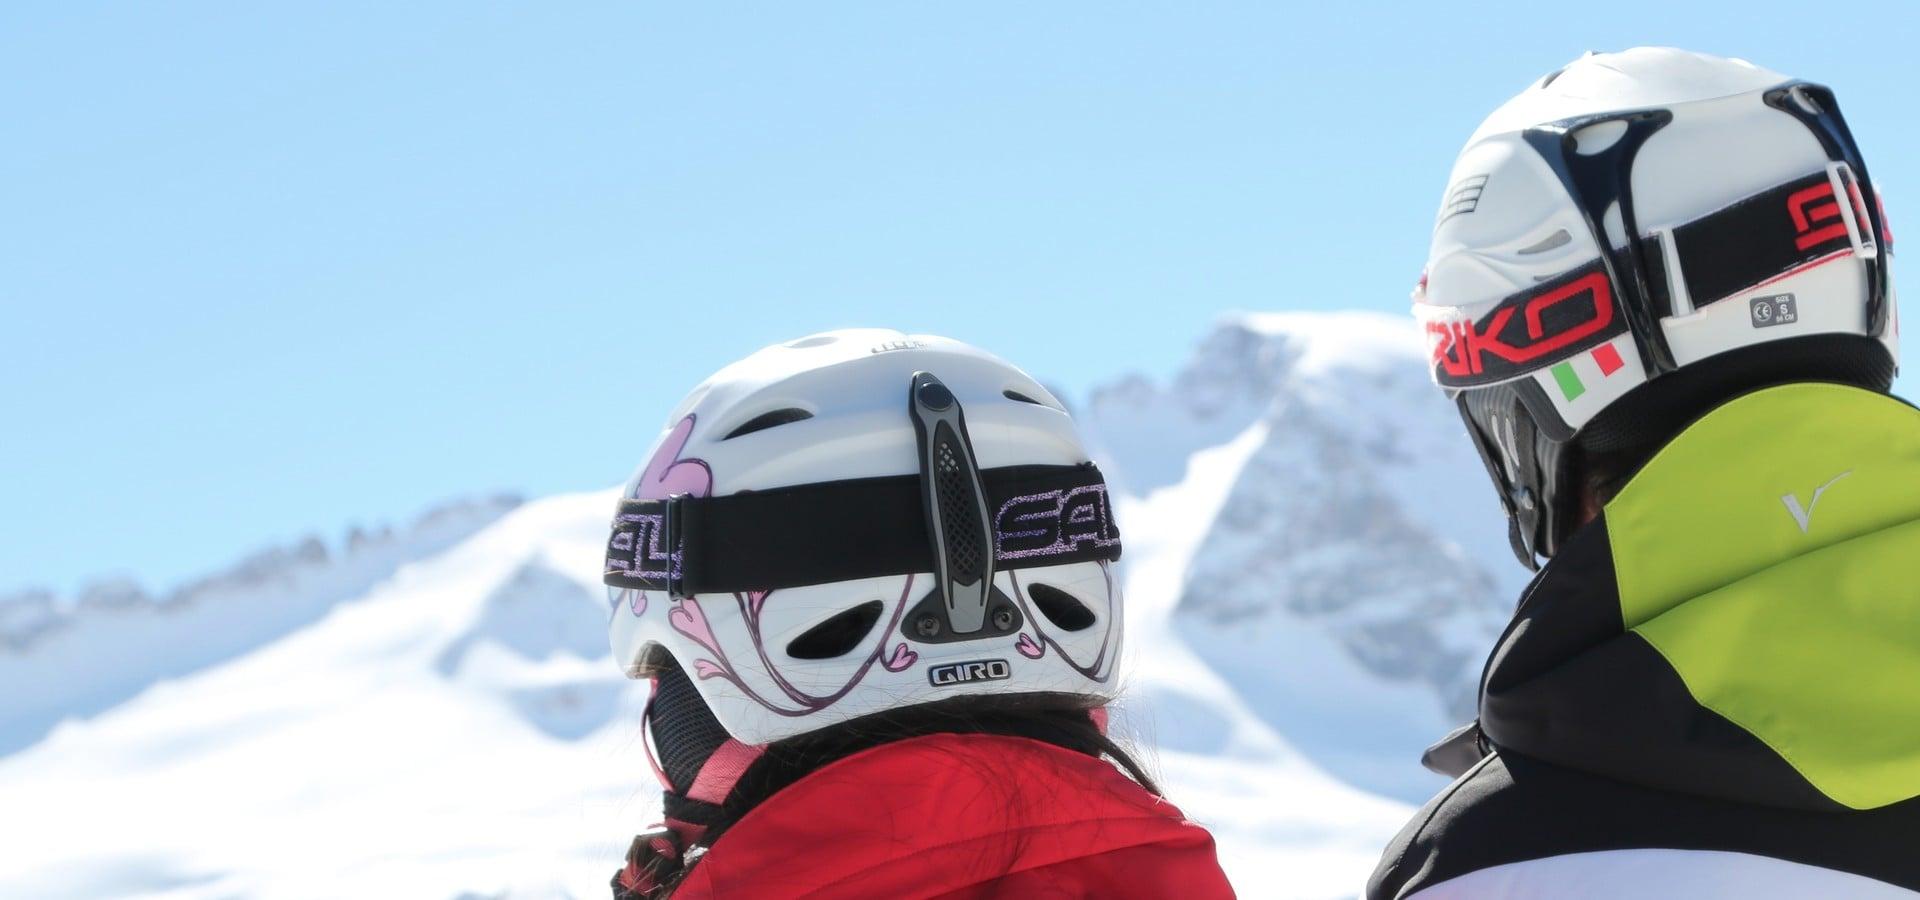 Arabba Dolomiti Super Première 2016